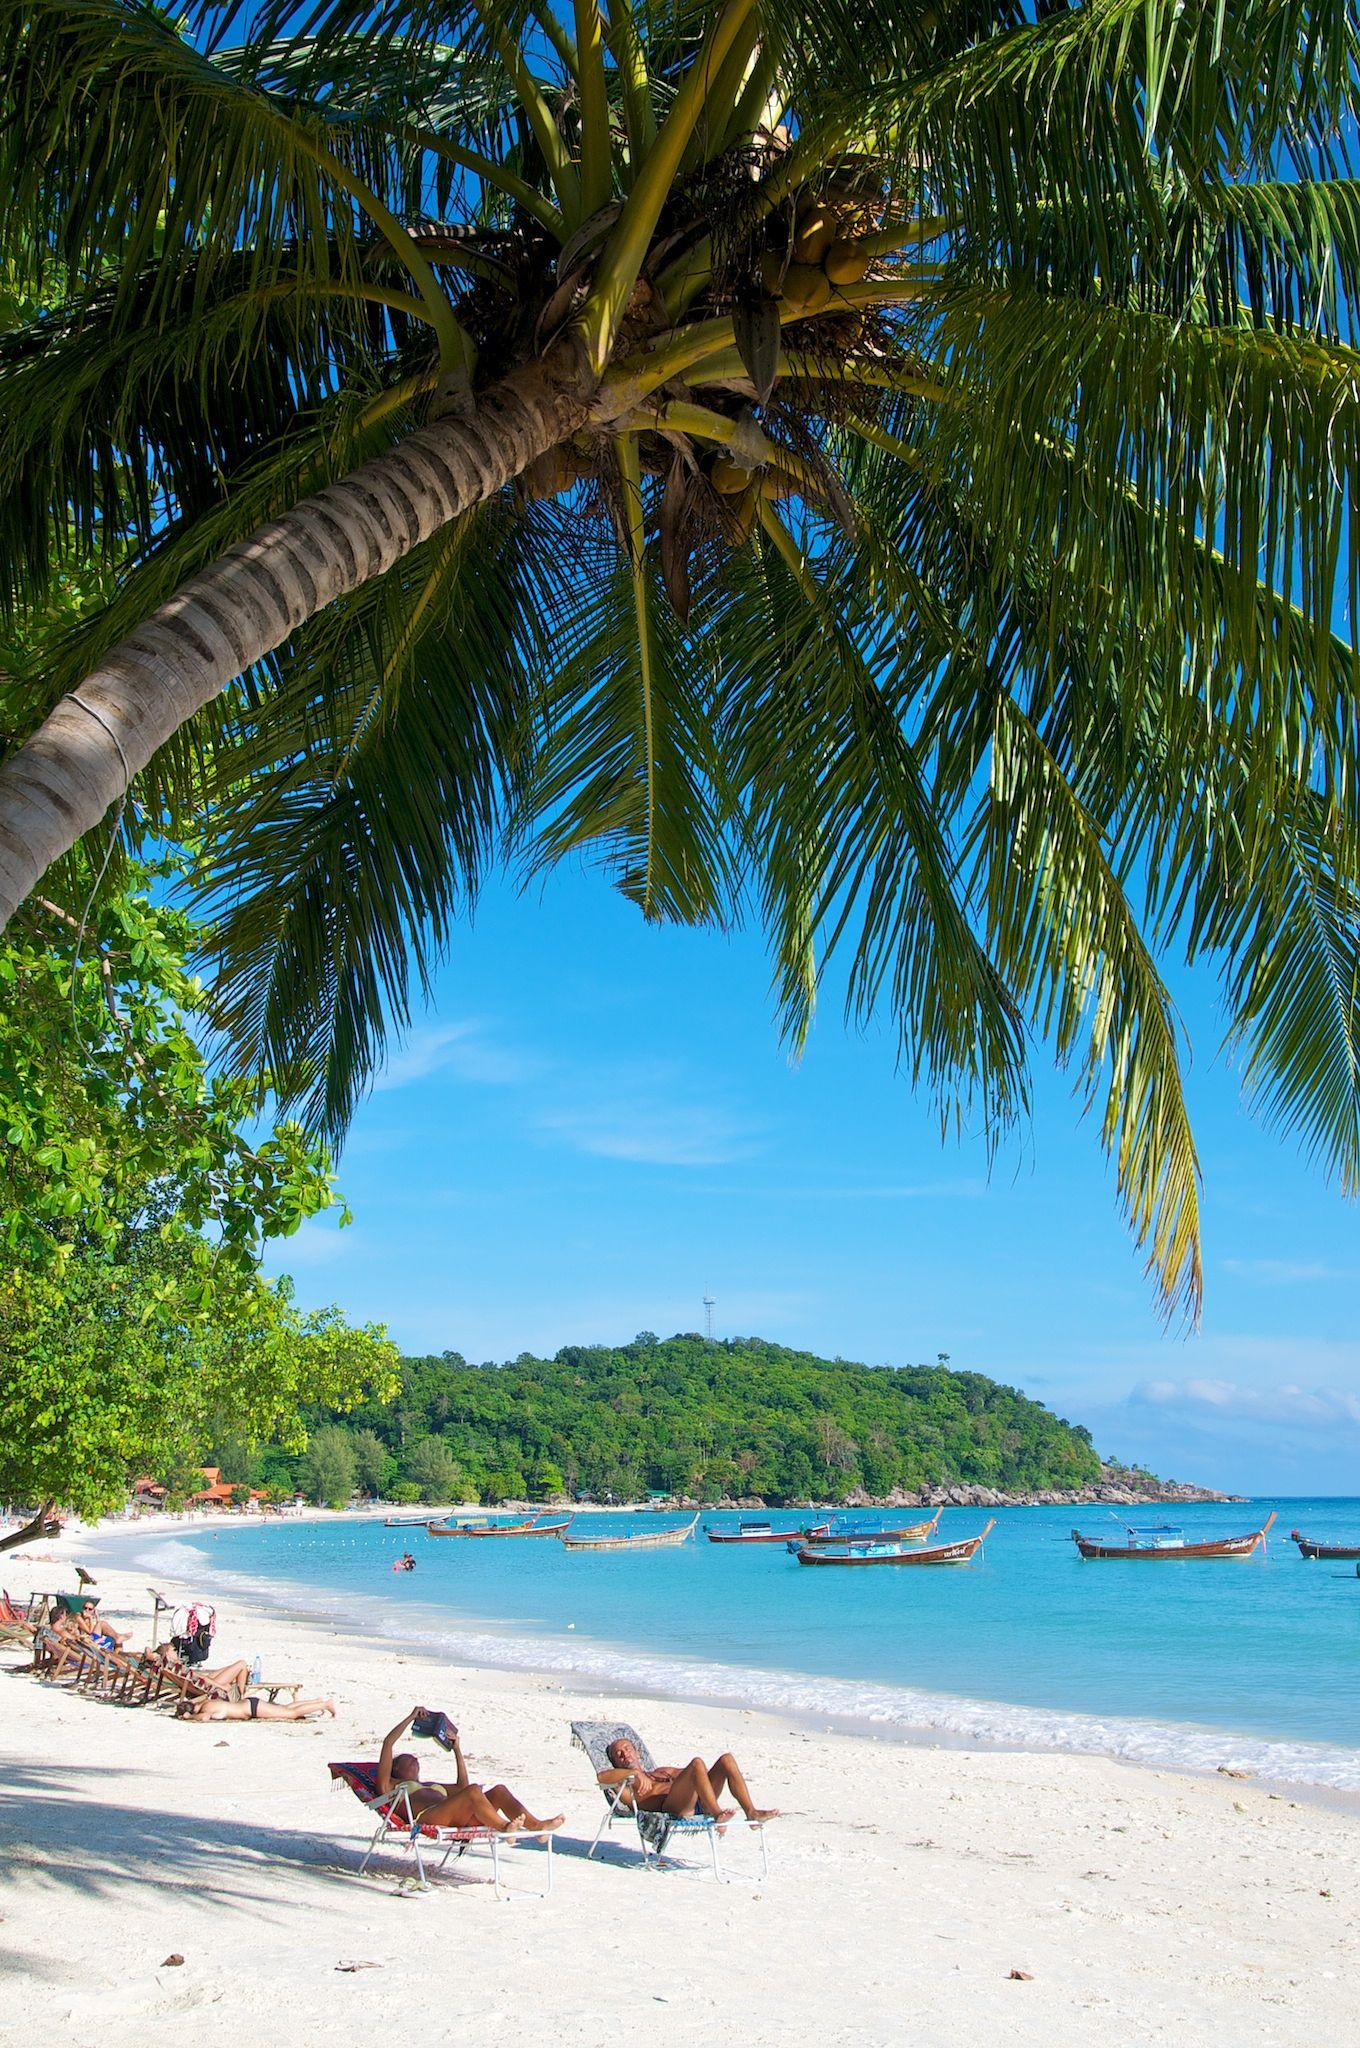 Pattaya Beach, Koh Lipe,Thailand,by Nicholas, on 500px.